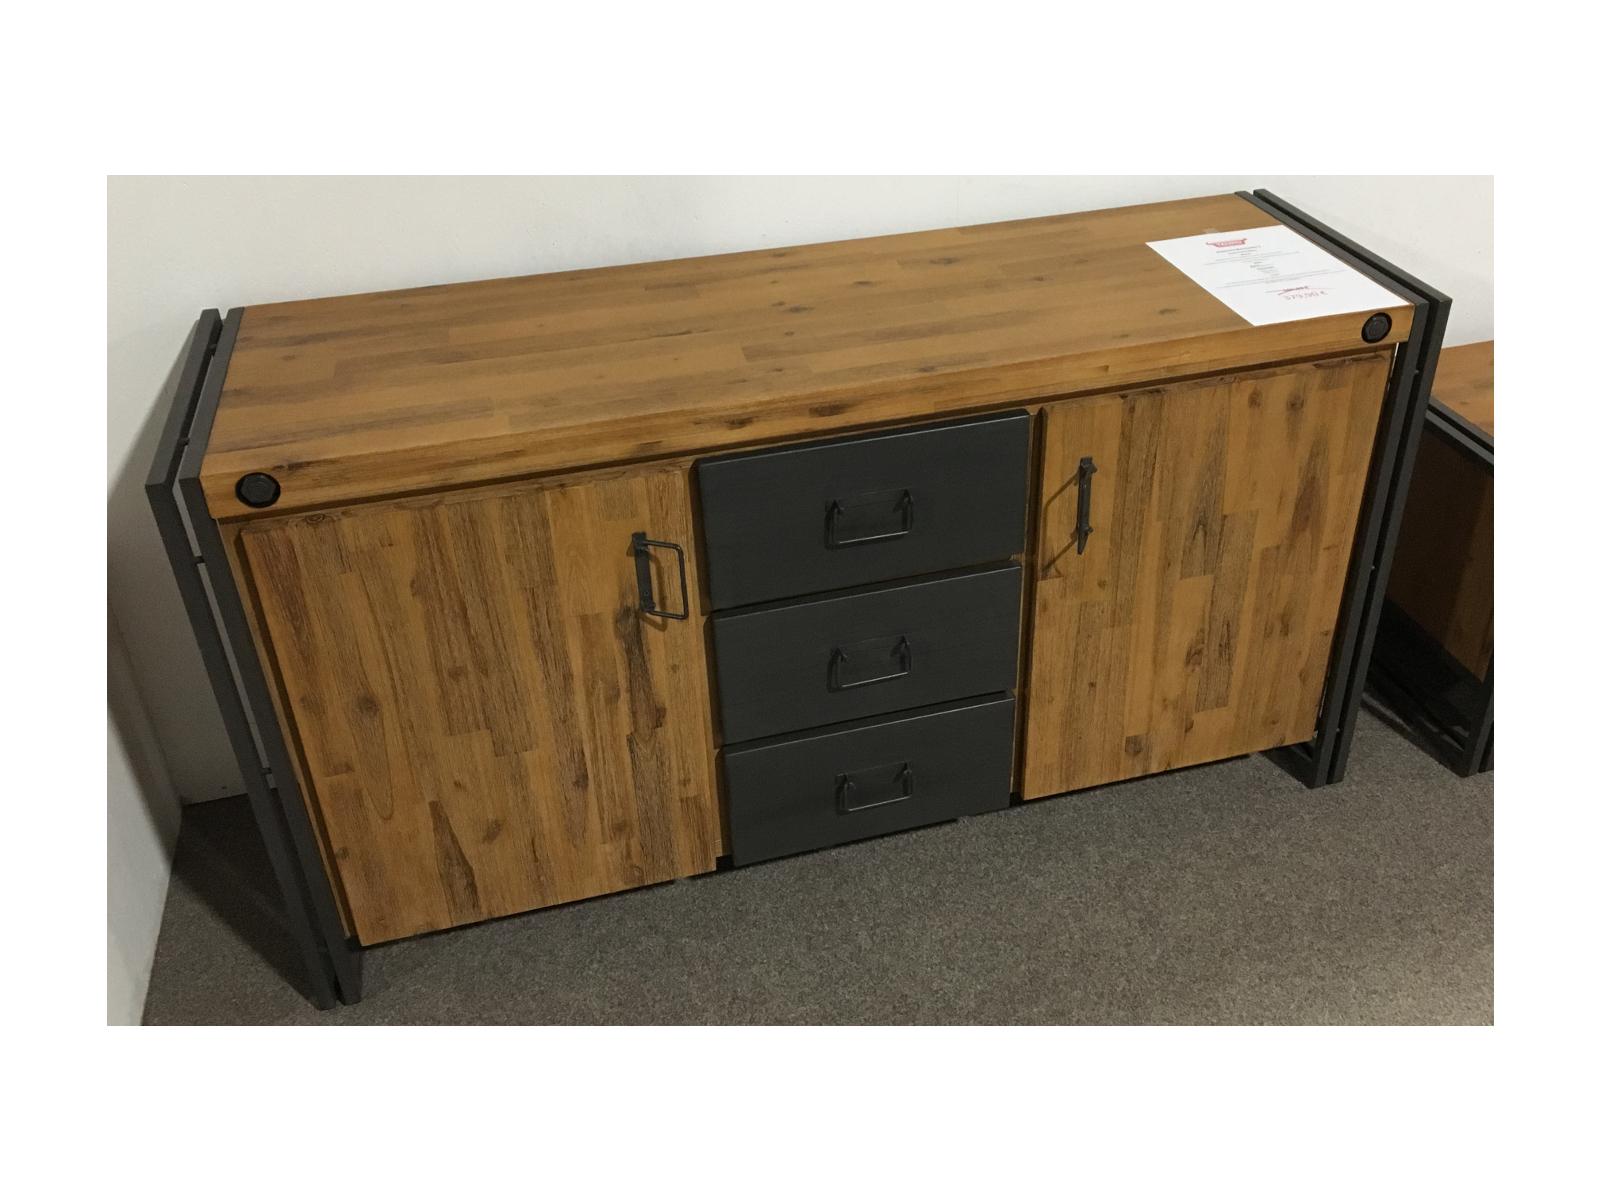 sideboard manchester ii akazie massiv metall kommode tv industrial ebay. Black Bedroom Furniture Sets. Home Design Ideas